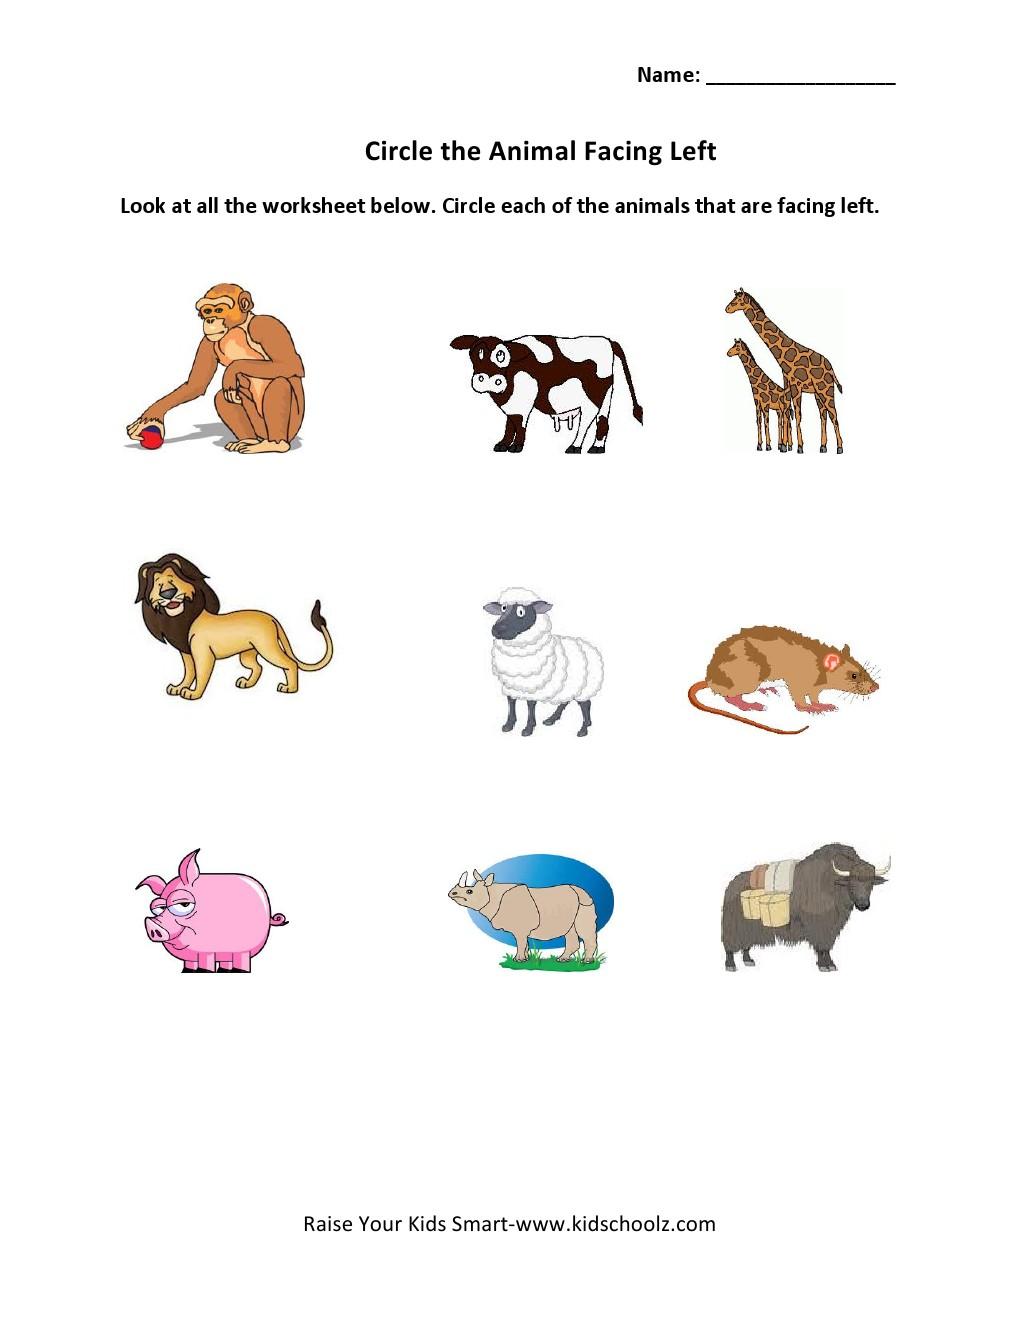 Grade 1 - Direction Worksheet 2 - Kidschoolz